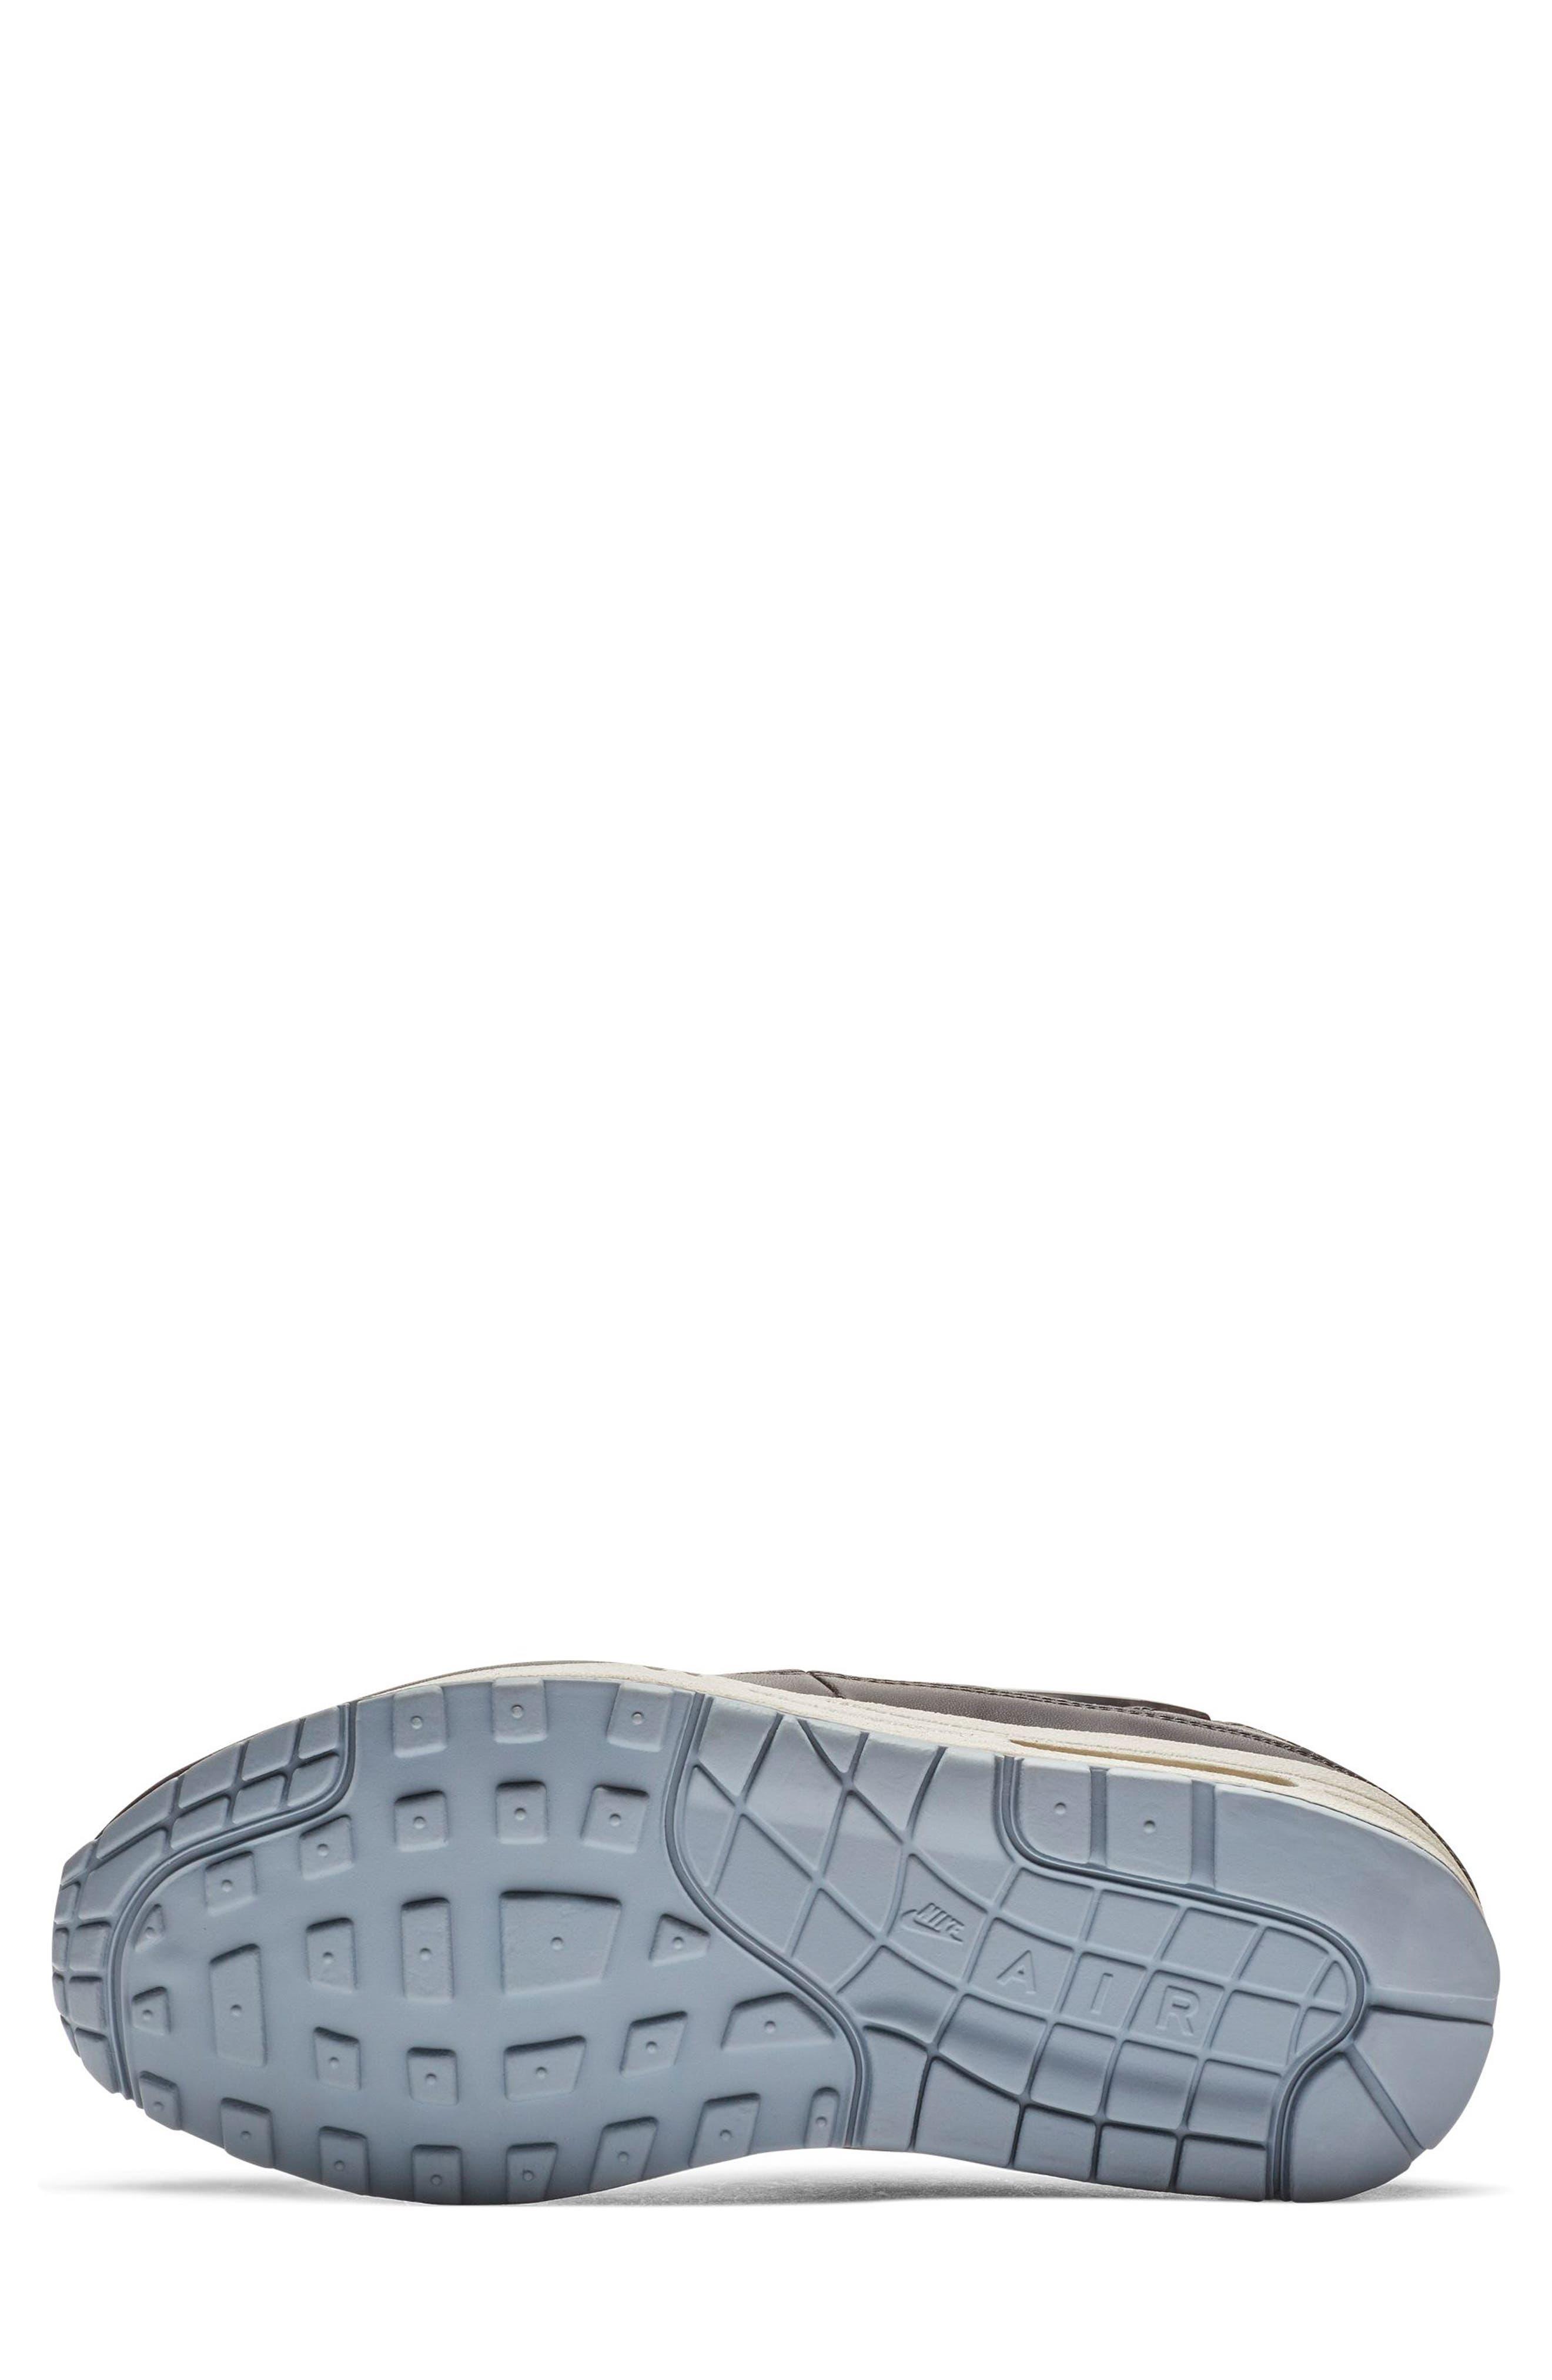 NIKE, Air Max 1 JP Sneaker, Alternate thumbnail 5, color, OIL GREY/ OBSIDIAN/ WHITE